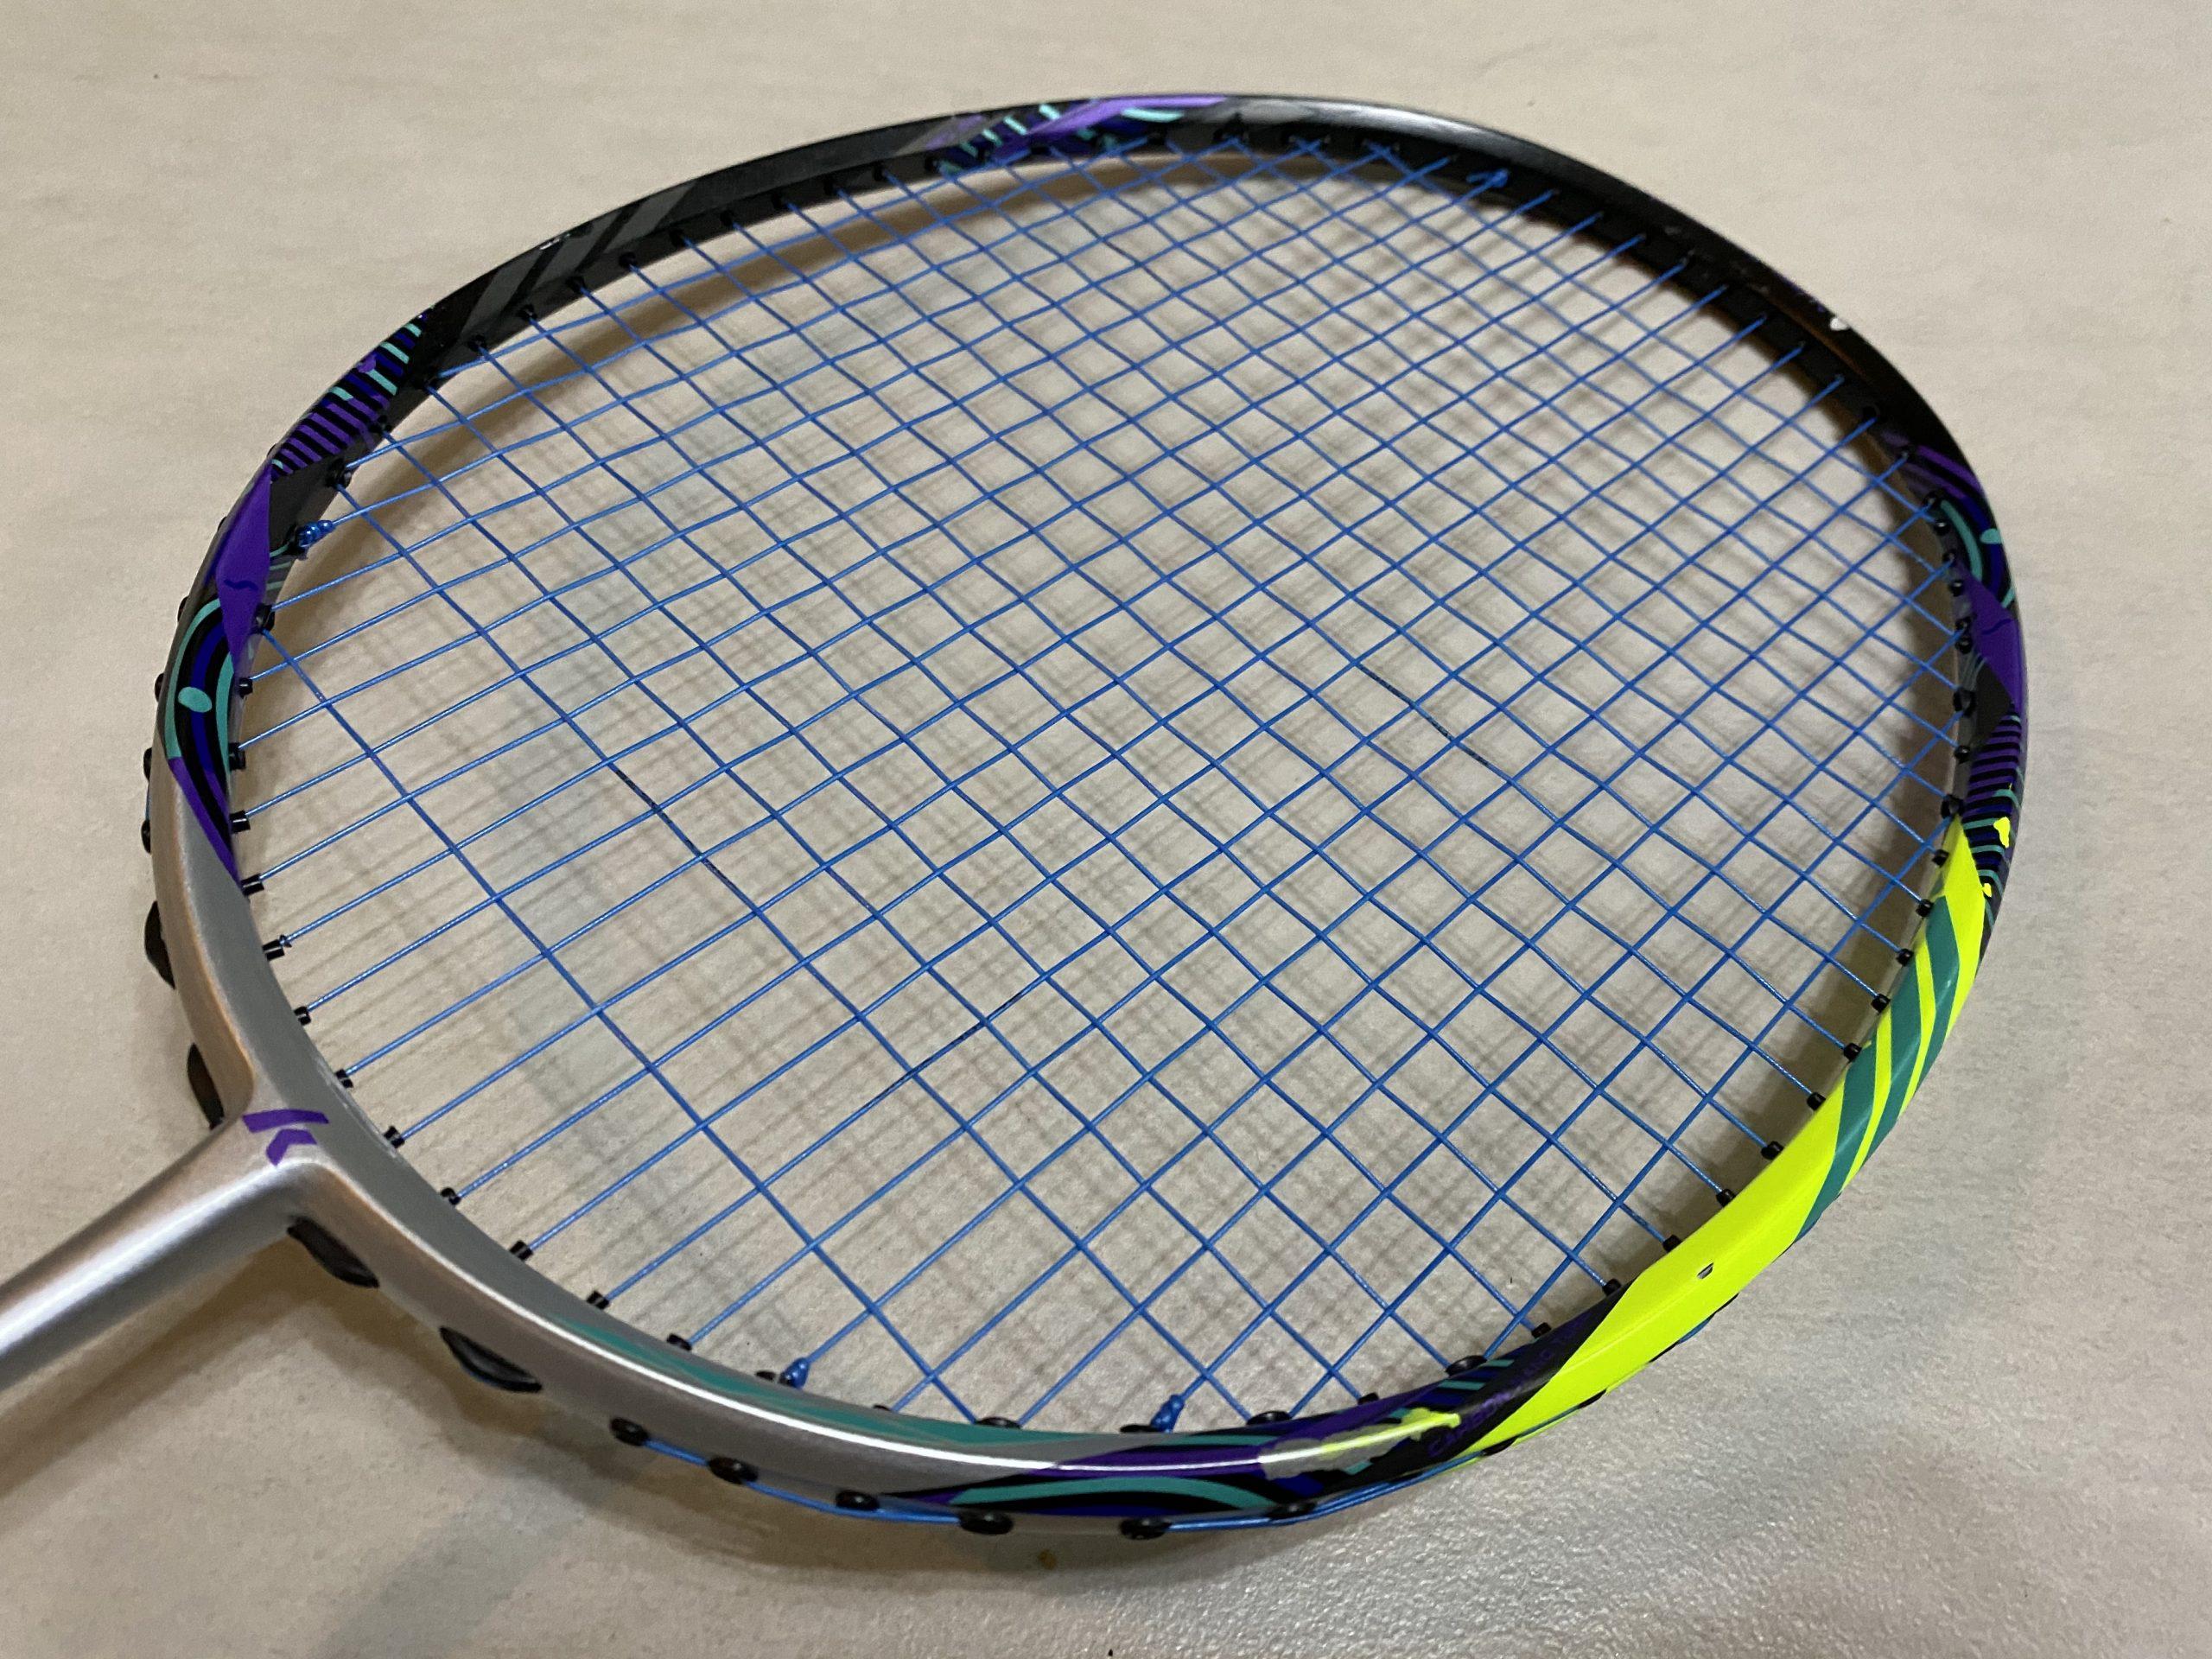 VGEBY1 2 pcs Badminton String,10m High Elastic Badminton String Durable Badminton Line with Good Durability for Badminton Rackets Shuttlecocks